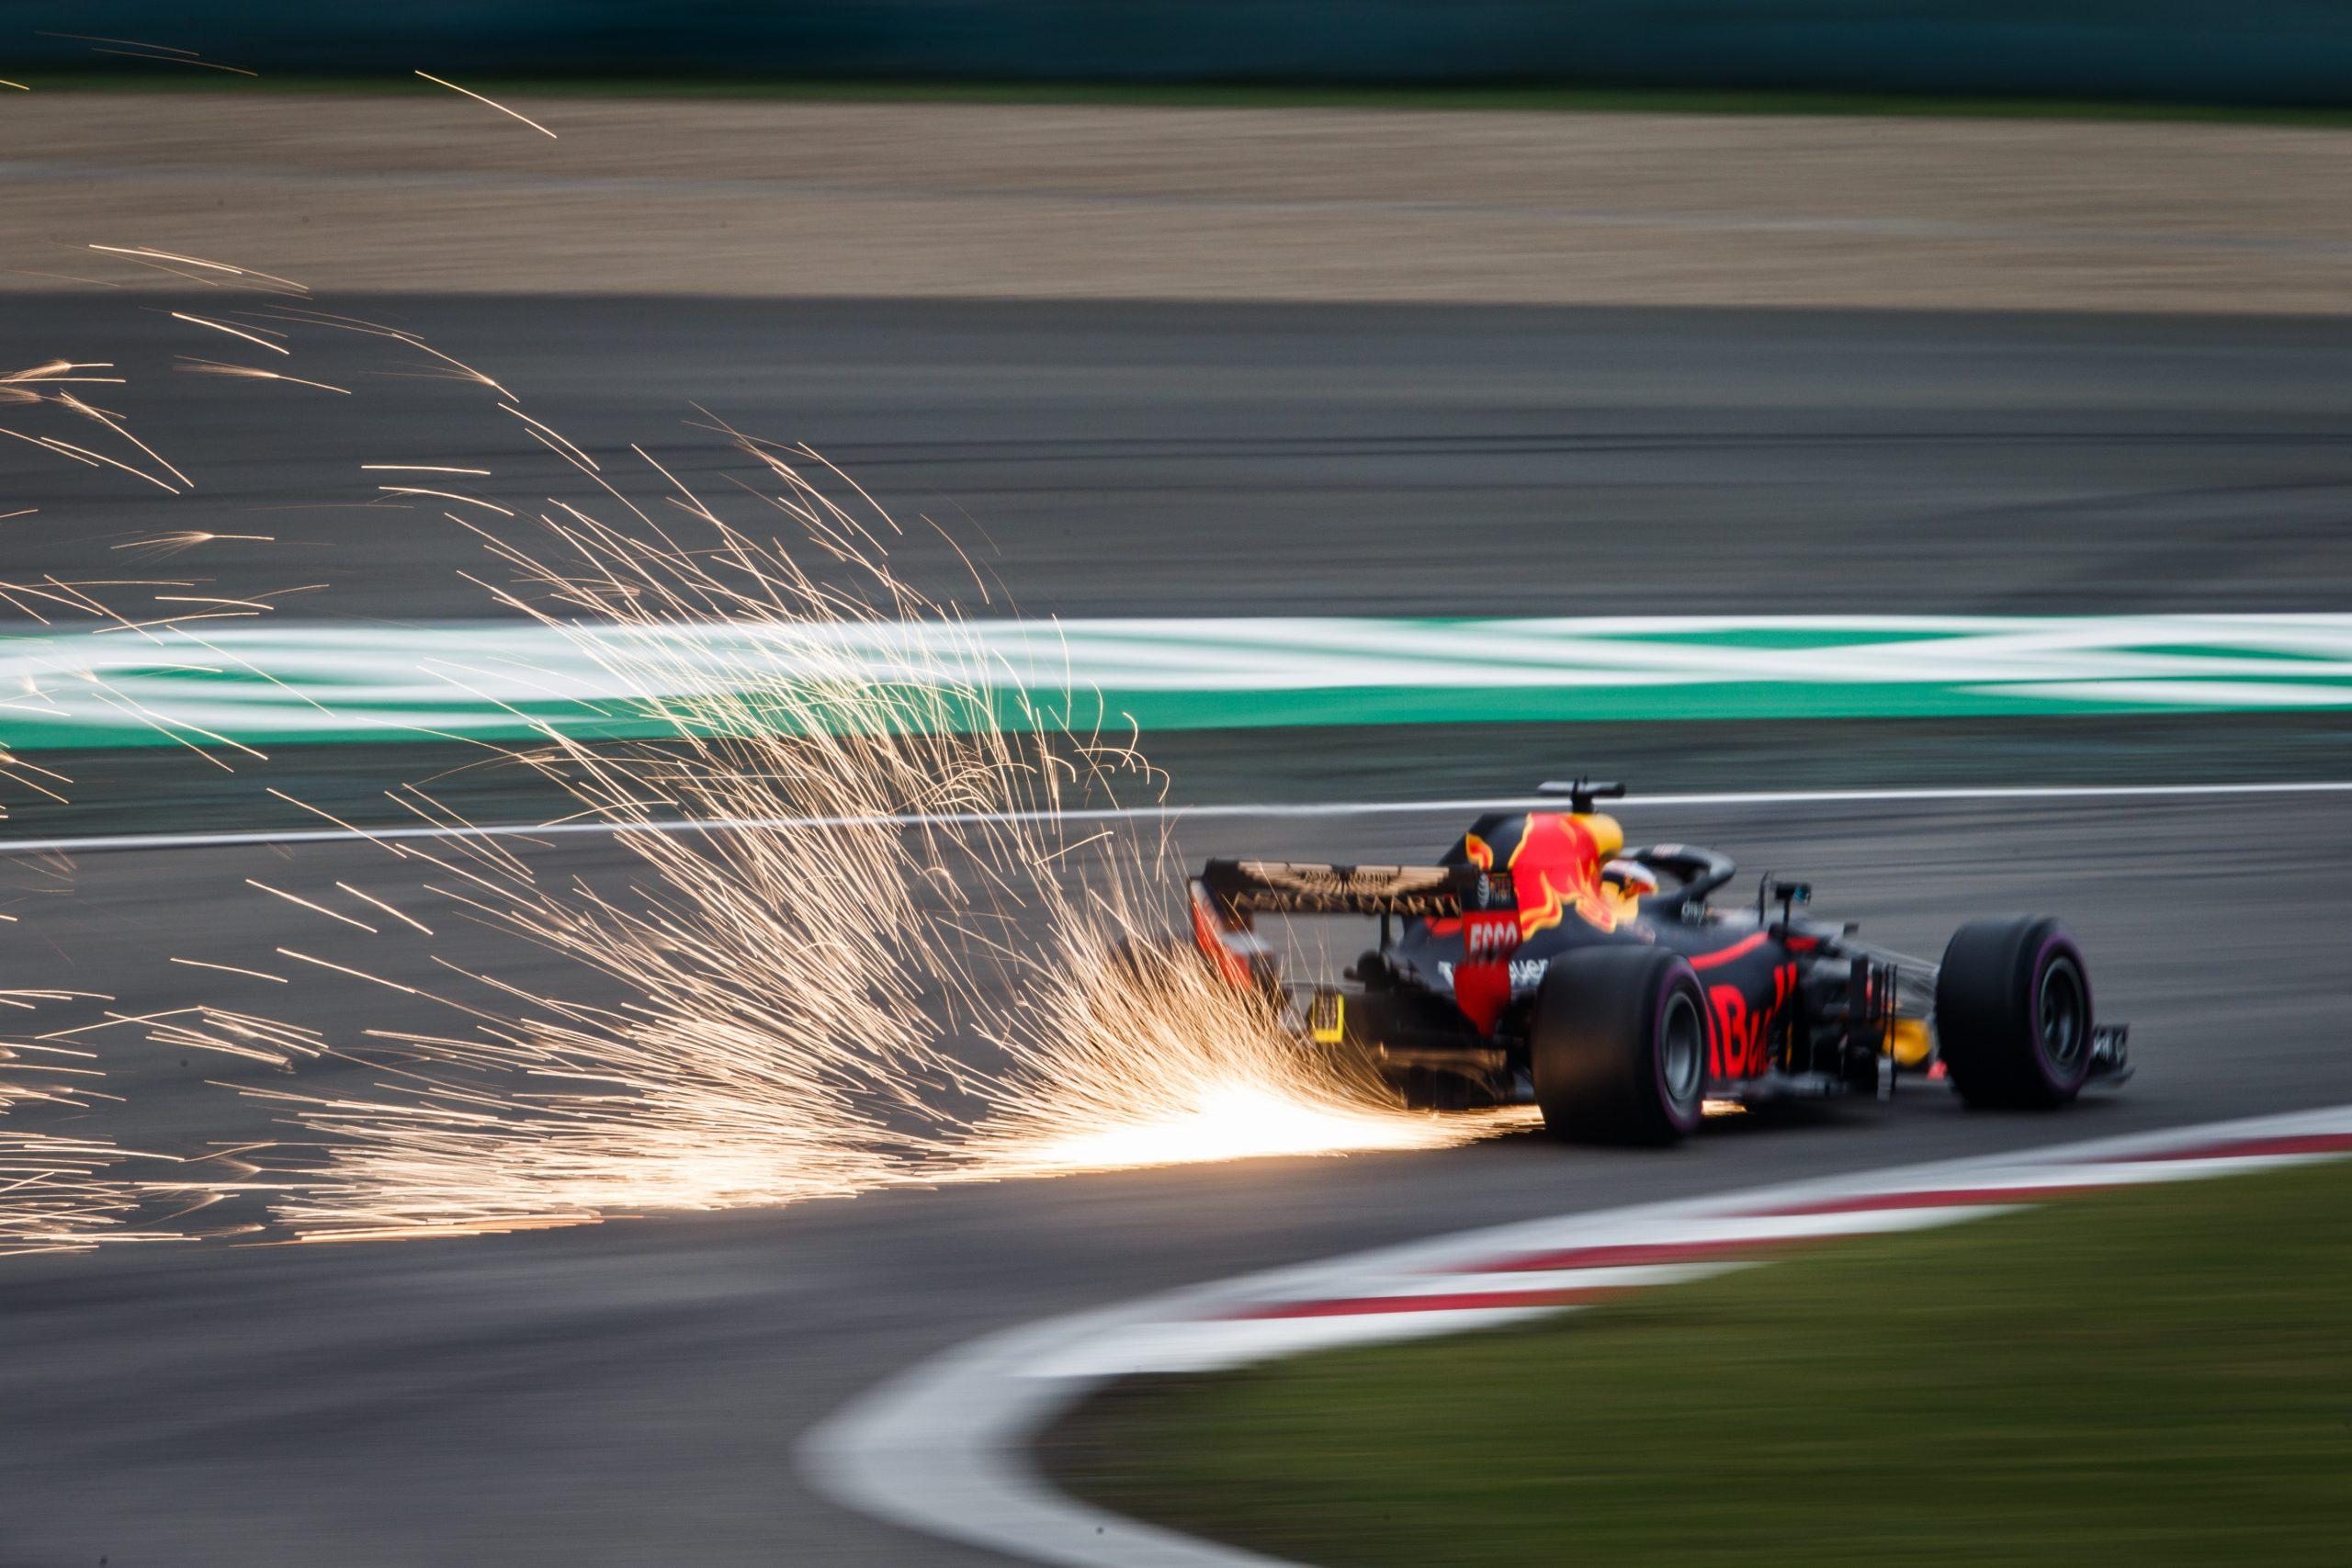 F1 – CHINA GRAND PRIX 2018